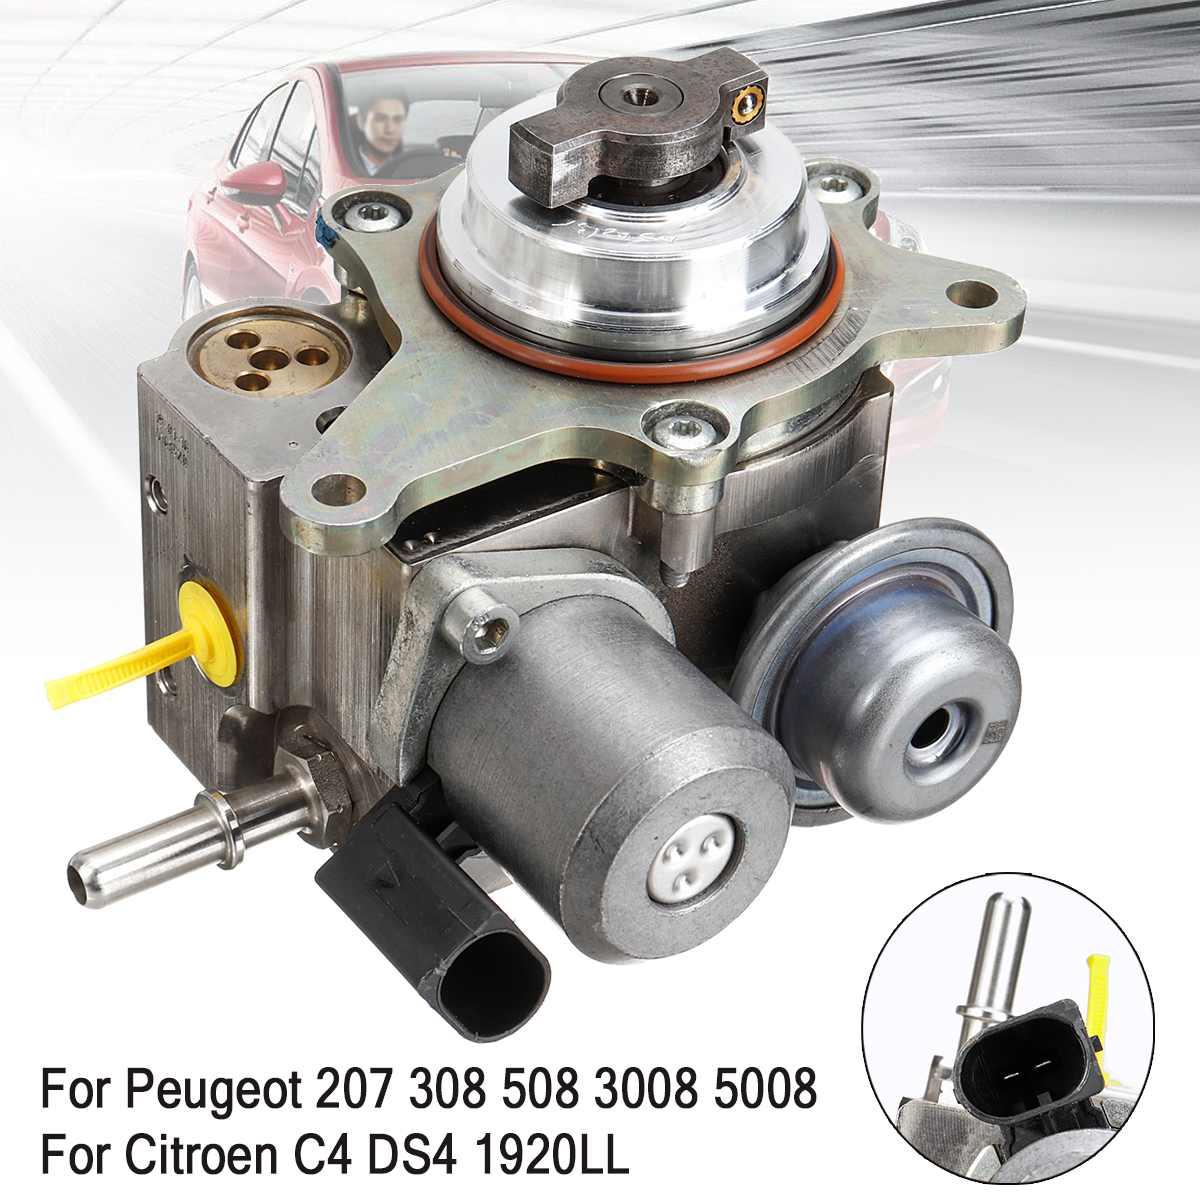 Benzin Druck Kraftstoff Pumpe 9819938480 13537528345 für Peugeot 207 308 3008 5008 508 1,6 T Mini R55 R56 R57 R58 cooper CITROEN C4